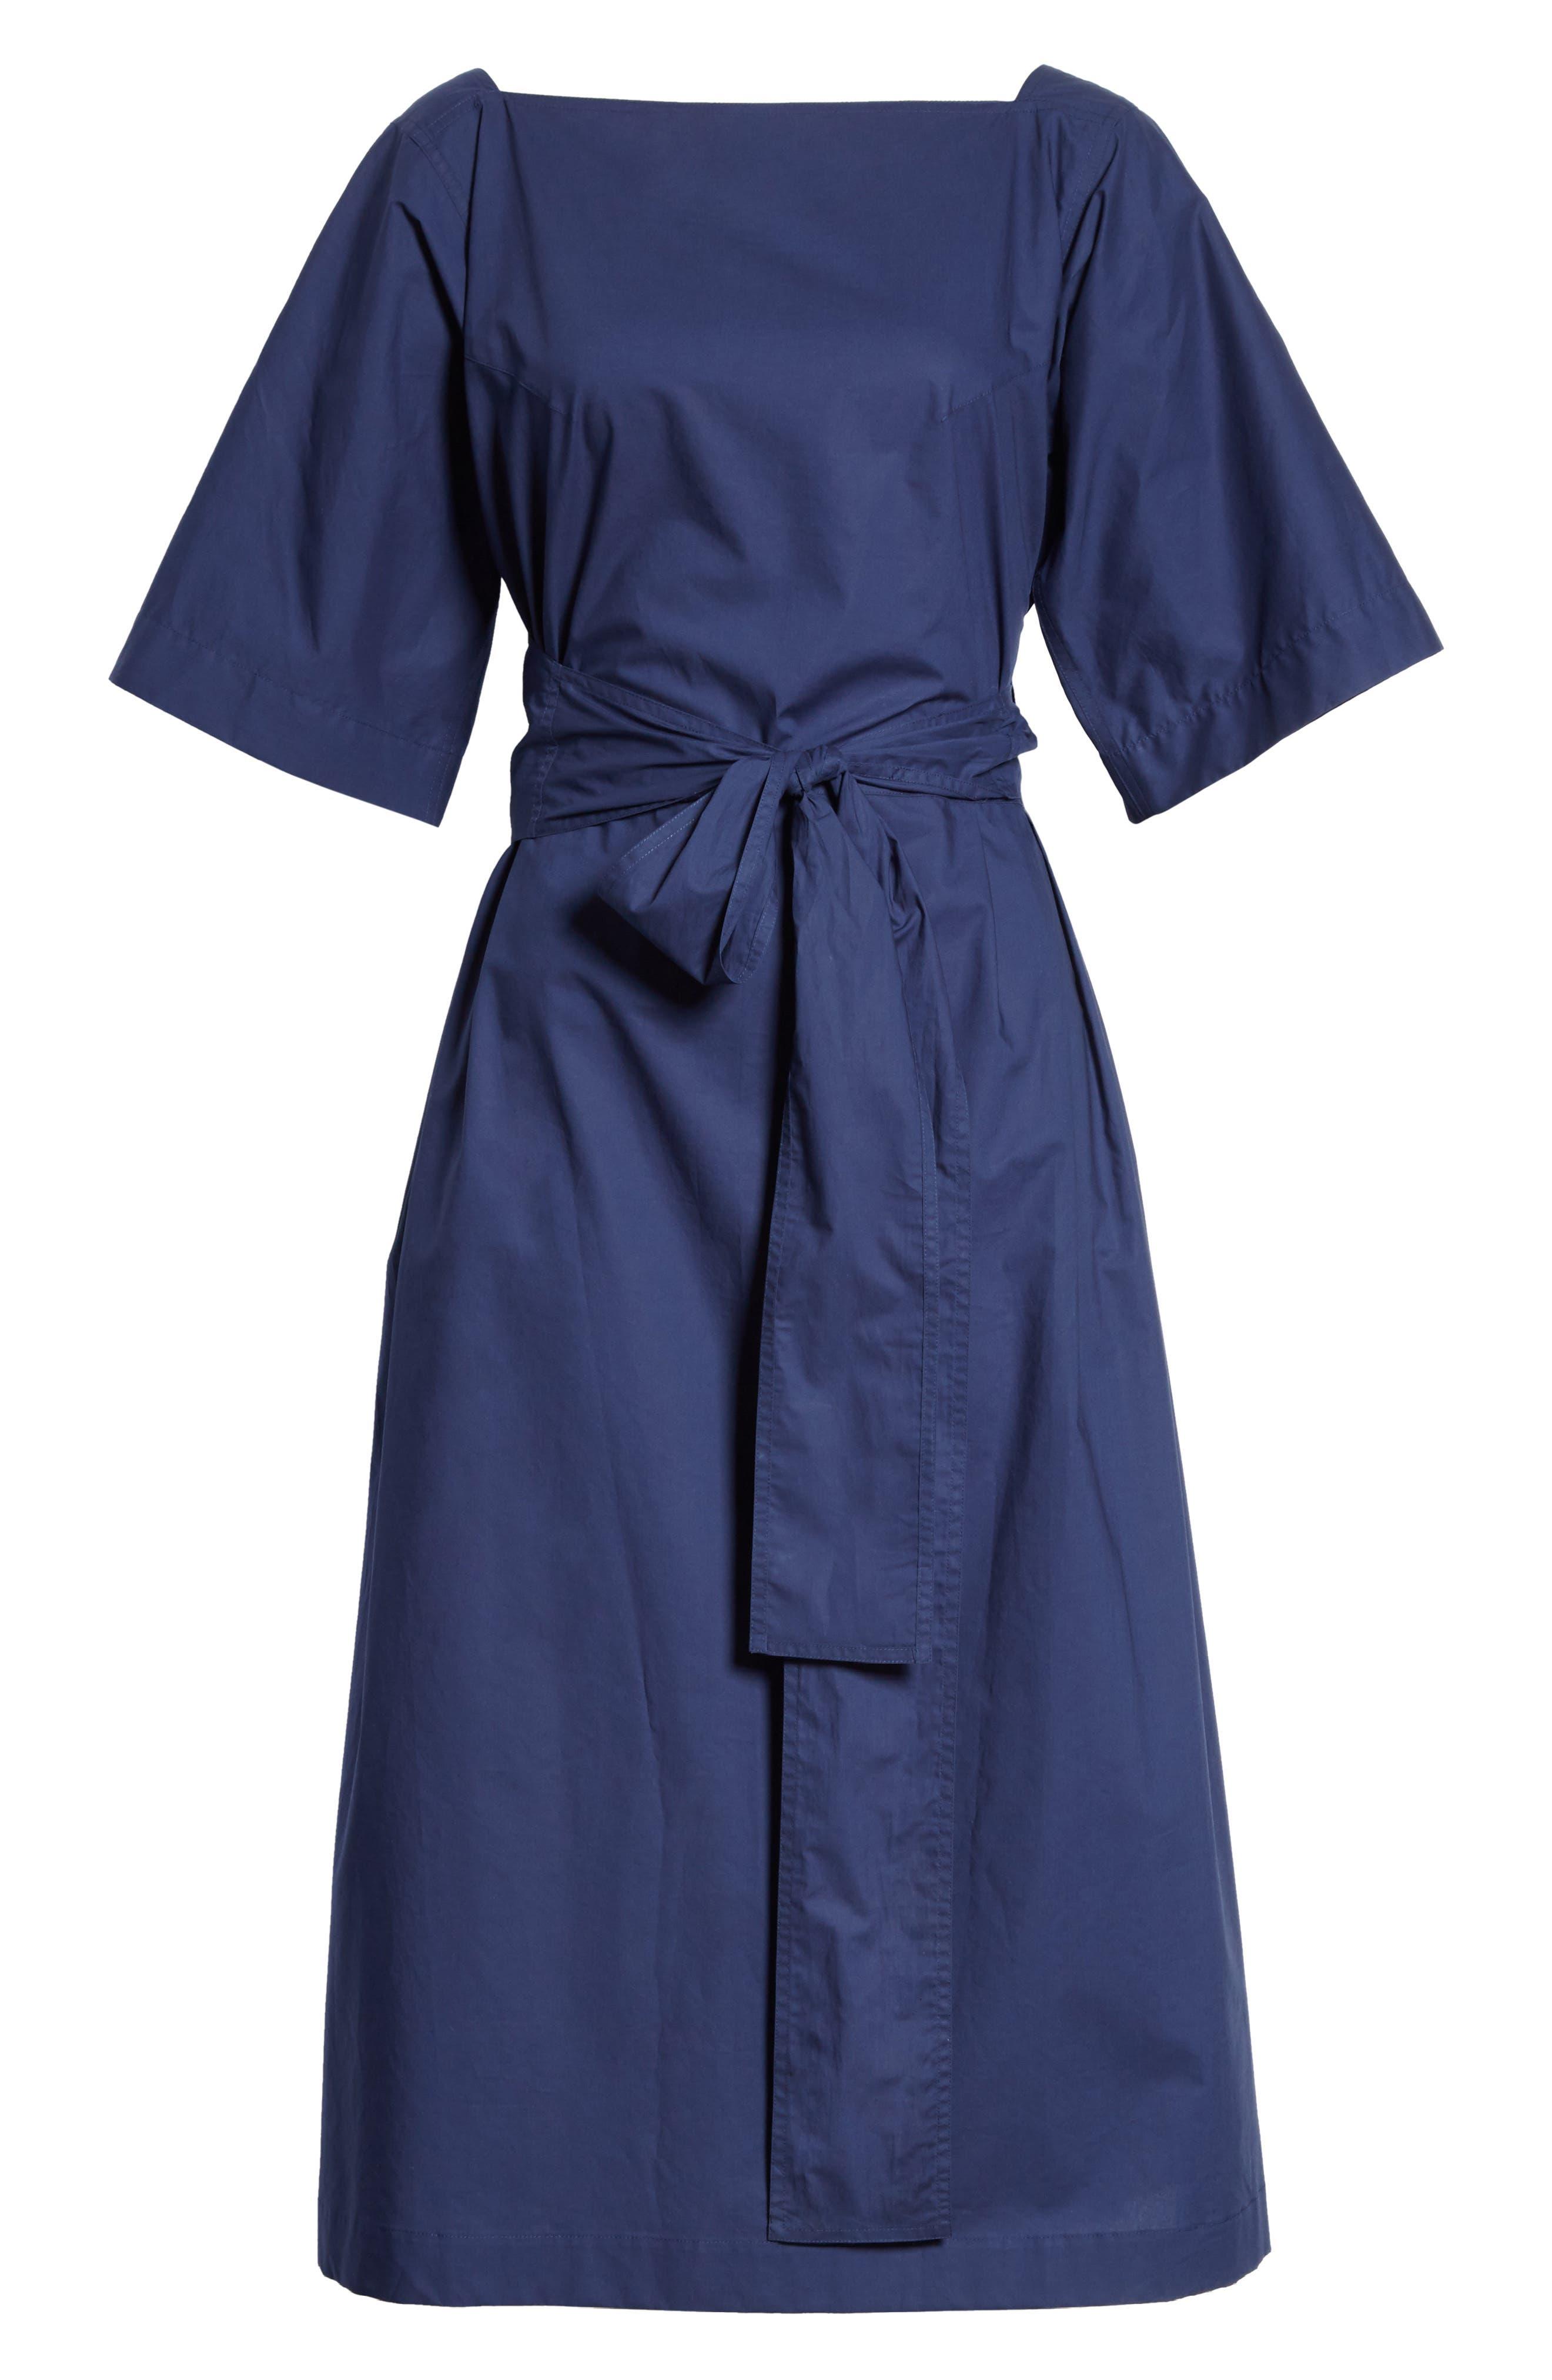 Tie Waist Dress,                             Alternate thumbnail 7, color,                             Matelot